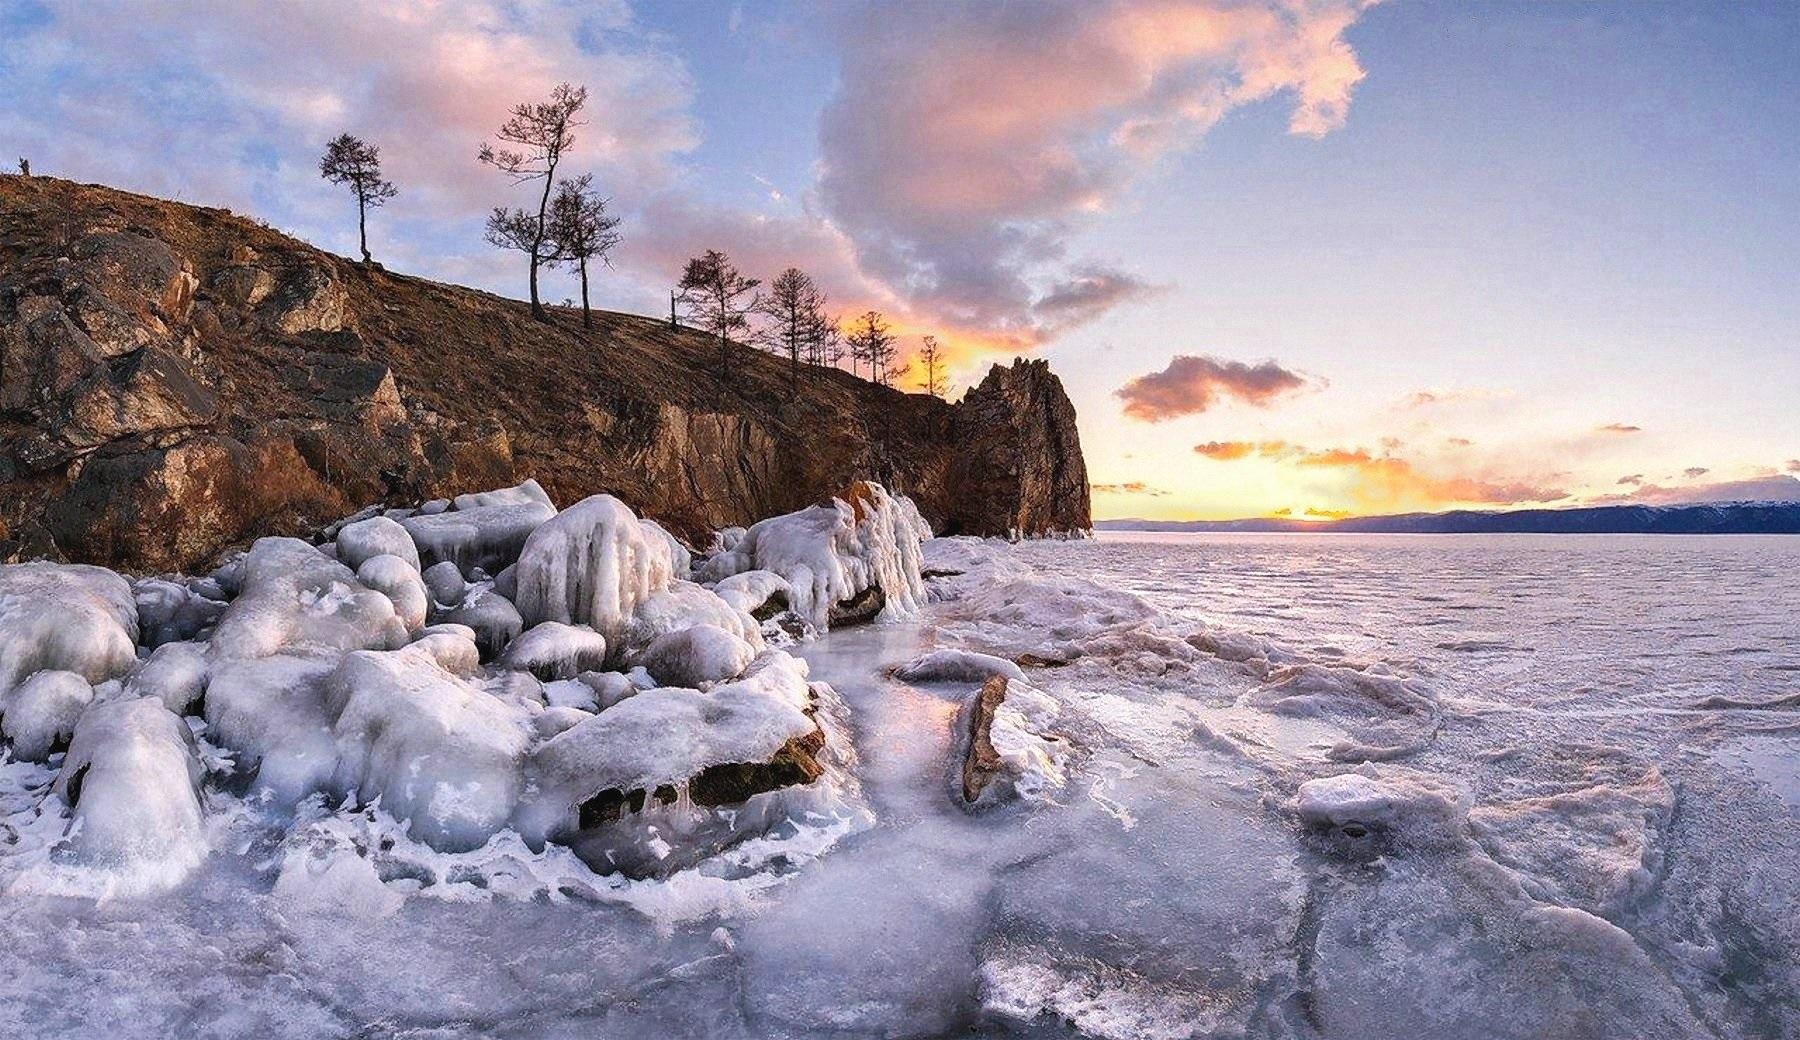 00 Anton Rostovsky. Sunset near Olkhon Island. Lake Baikal, Russia. 2015